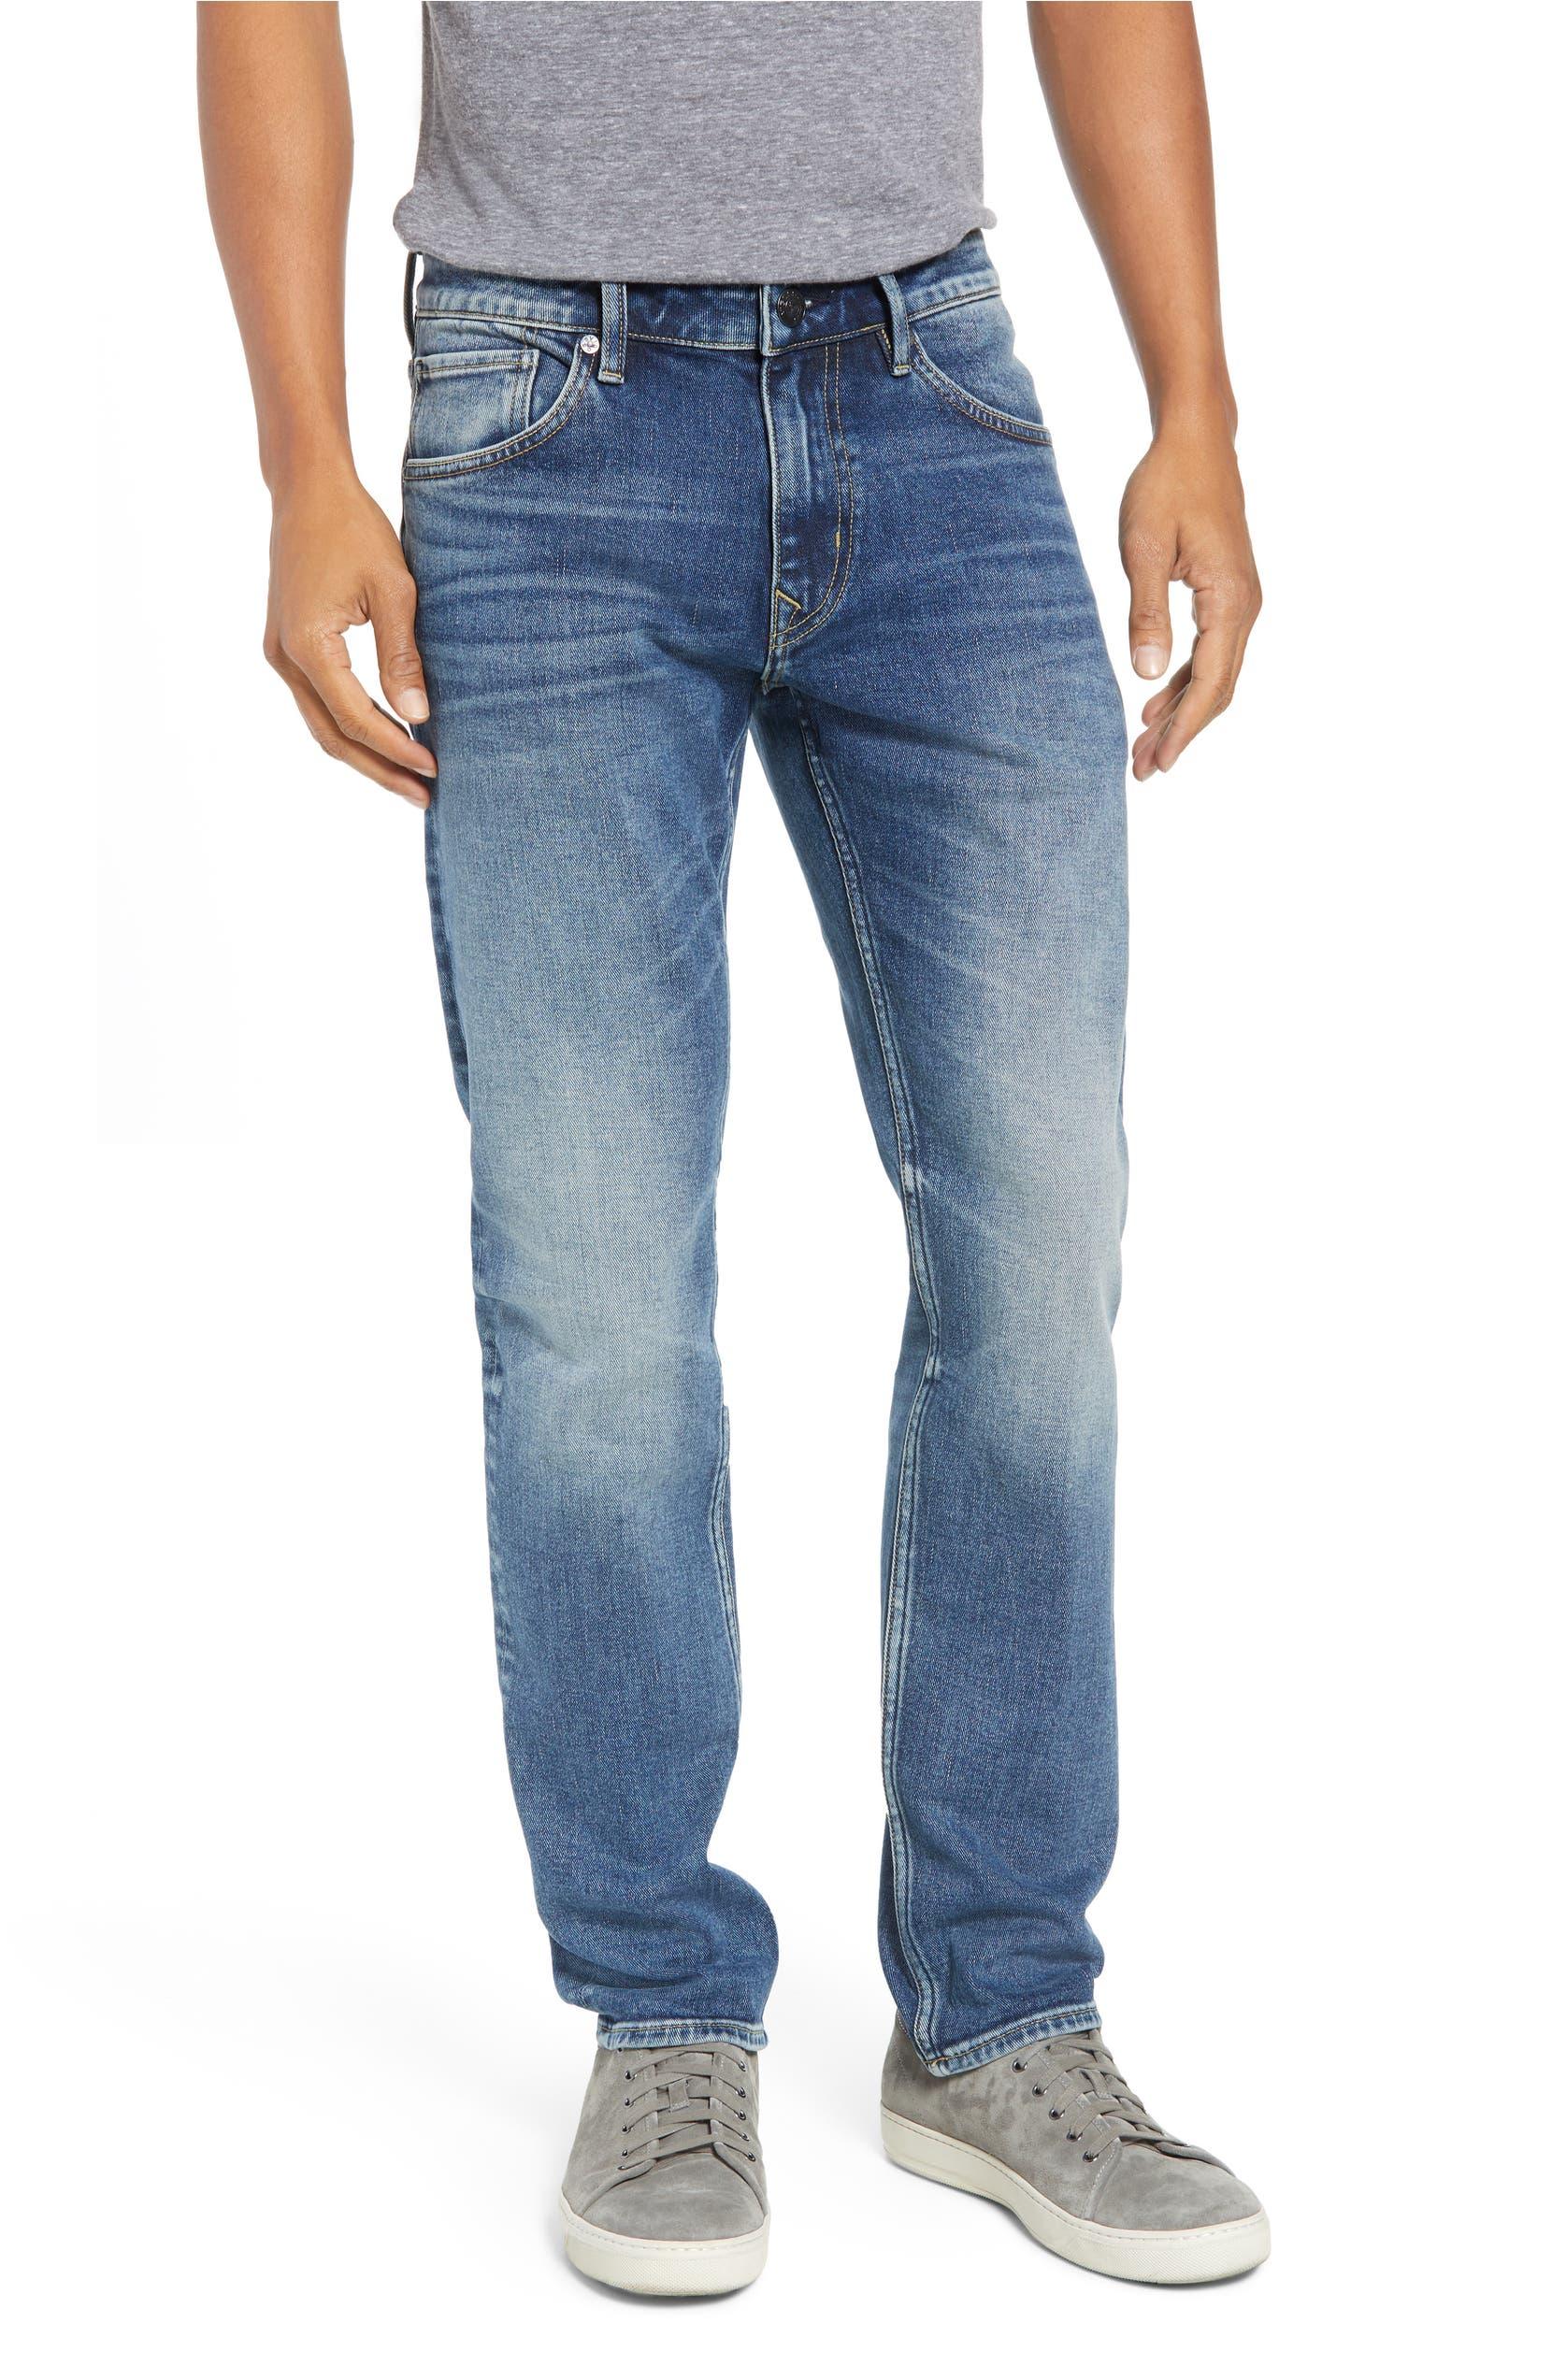 290928b0179 Vigoss Mick Slim Fit Jeans